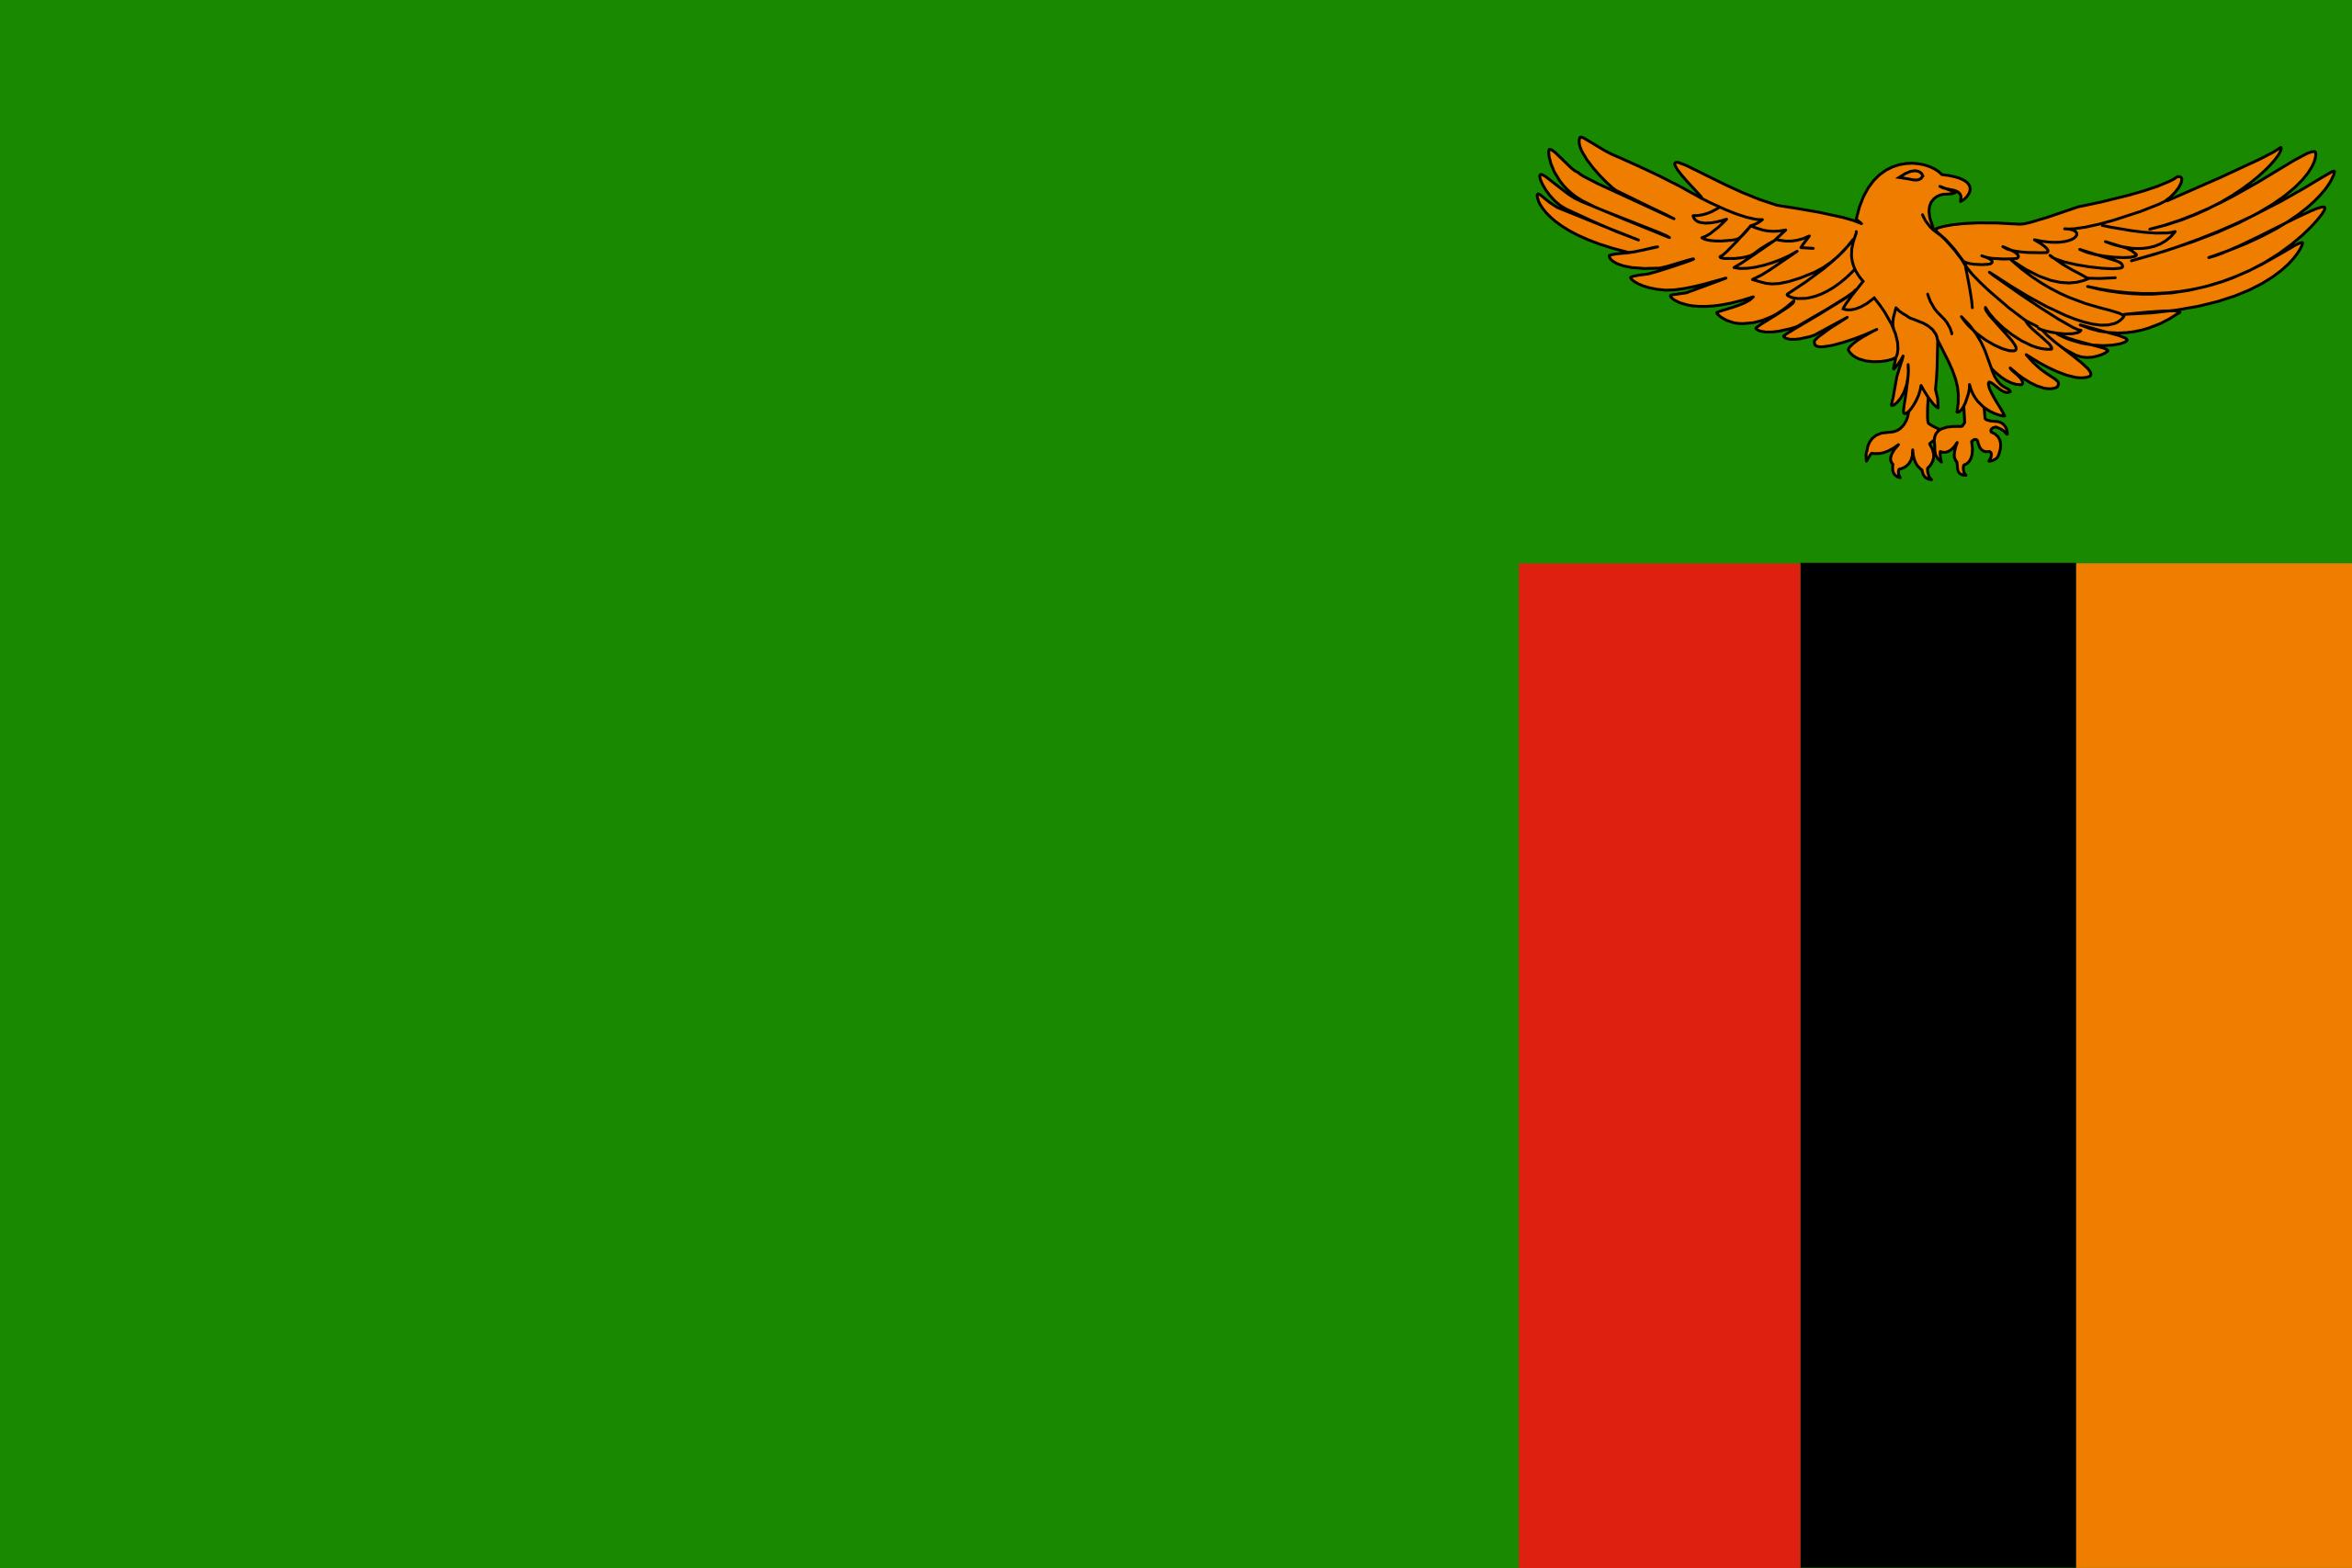 Zambie, pays, emblème, logo, symbole - Fonds d'écran HD - Professor-falken.com